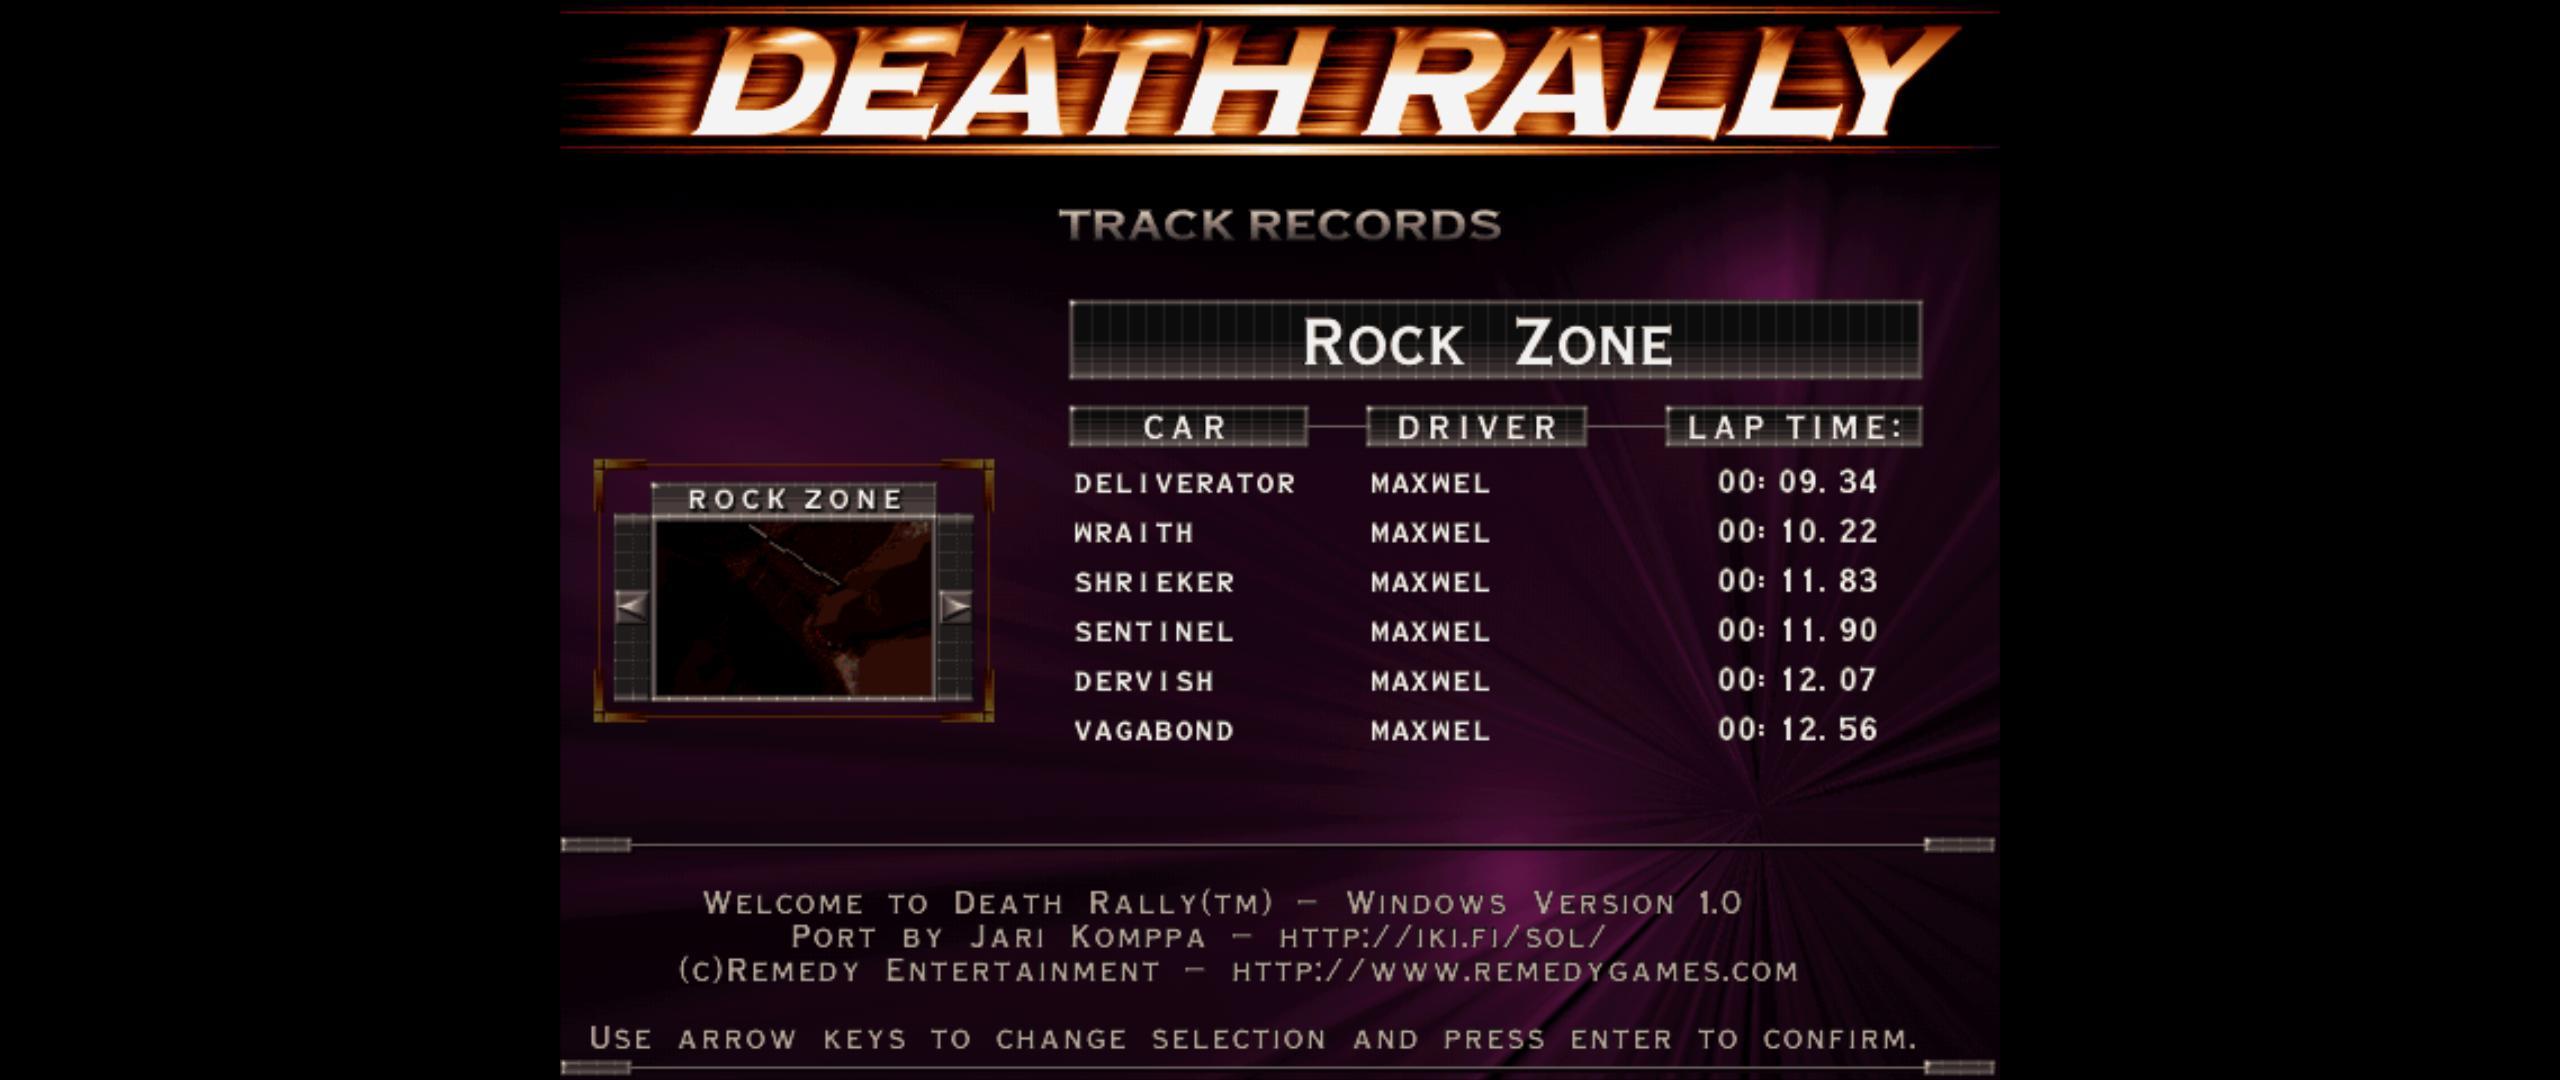 Maxwel: Death Rally [Rock Zone, Wraith Car] (PC) 0:00:10.22 points on 2016-03-03 02:54:09